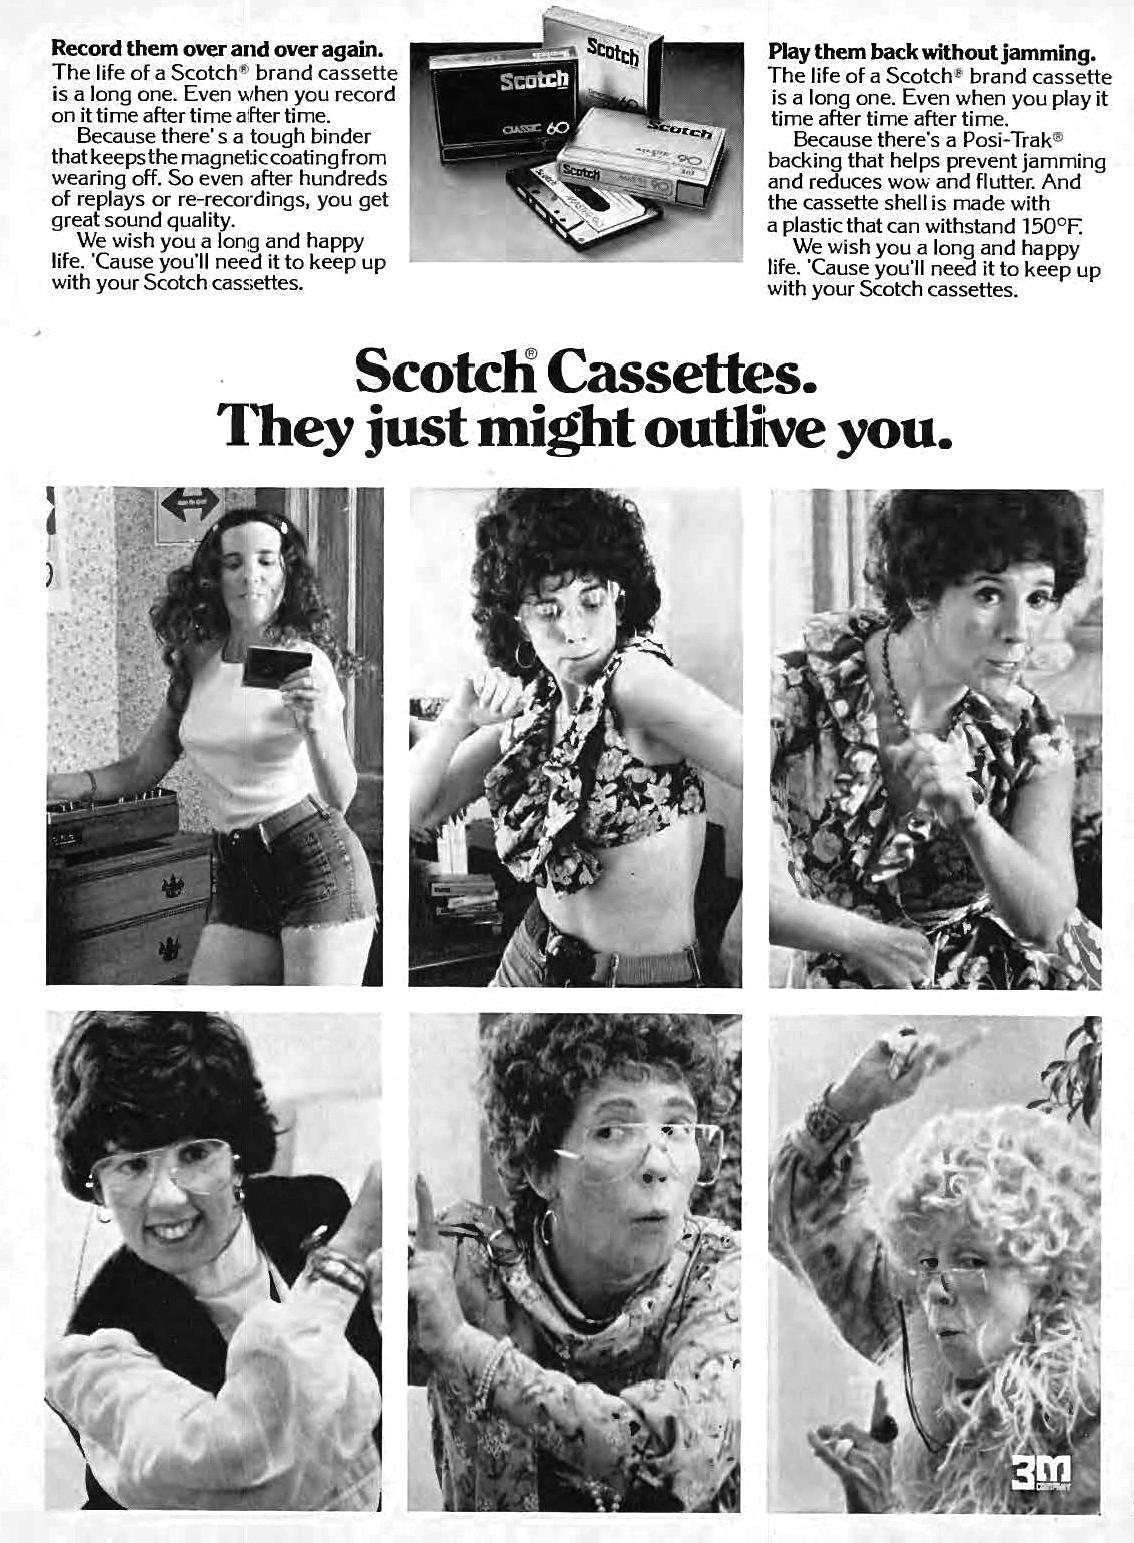 scotch_age_cassette-ad-playboy-magazine-09-september-1976.jpg